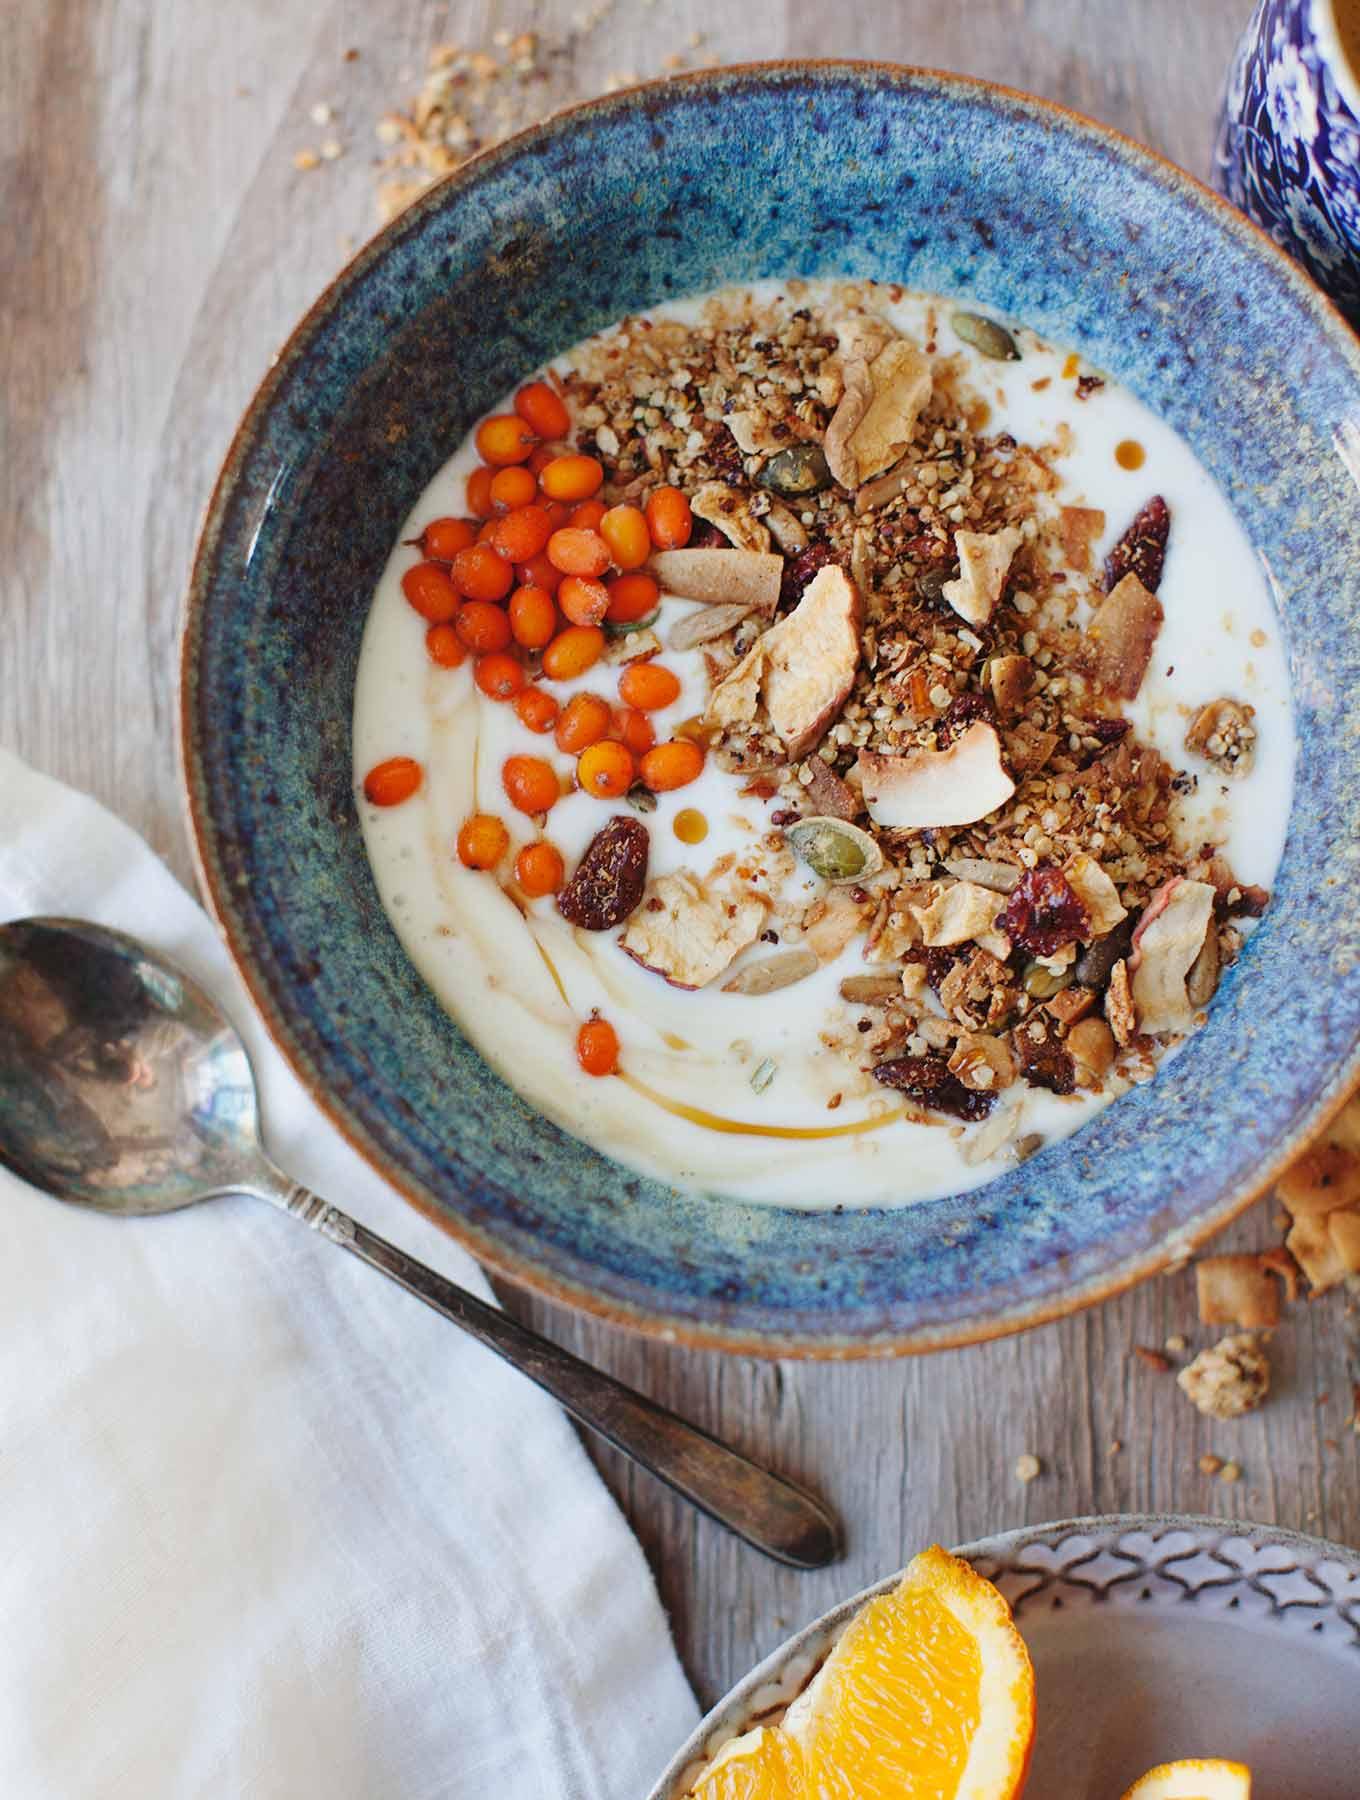 NoMad Luxuries Sunday Pairings bowl of muesli breakfast